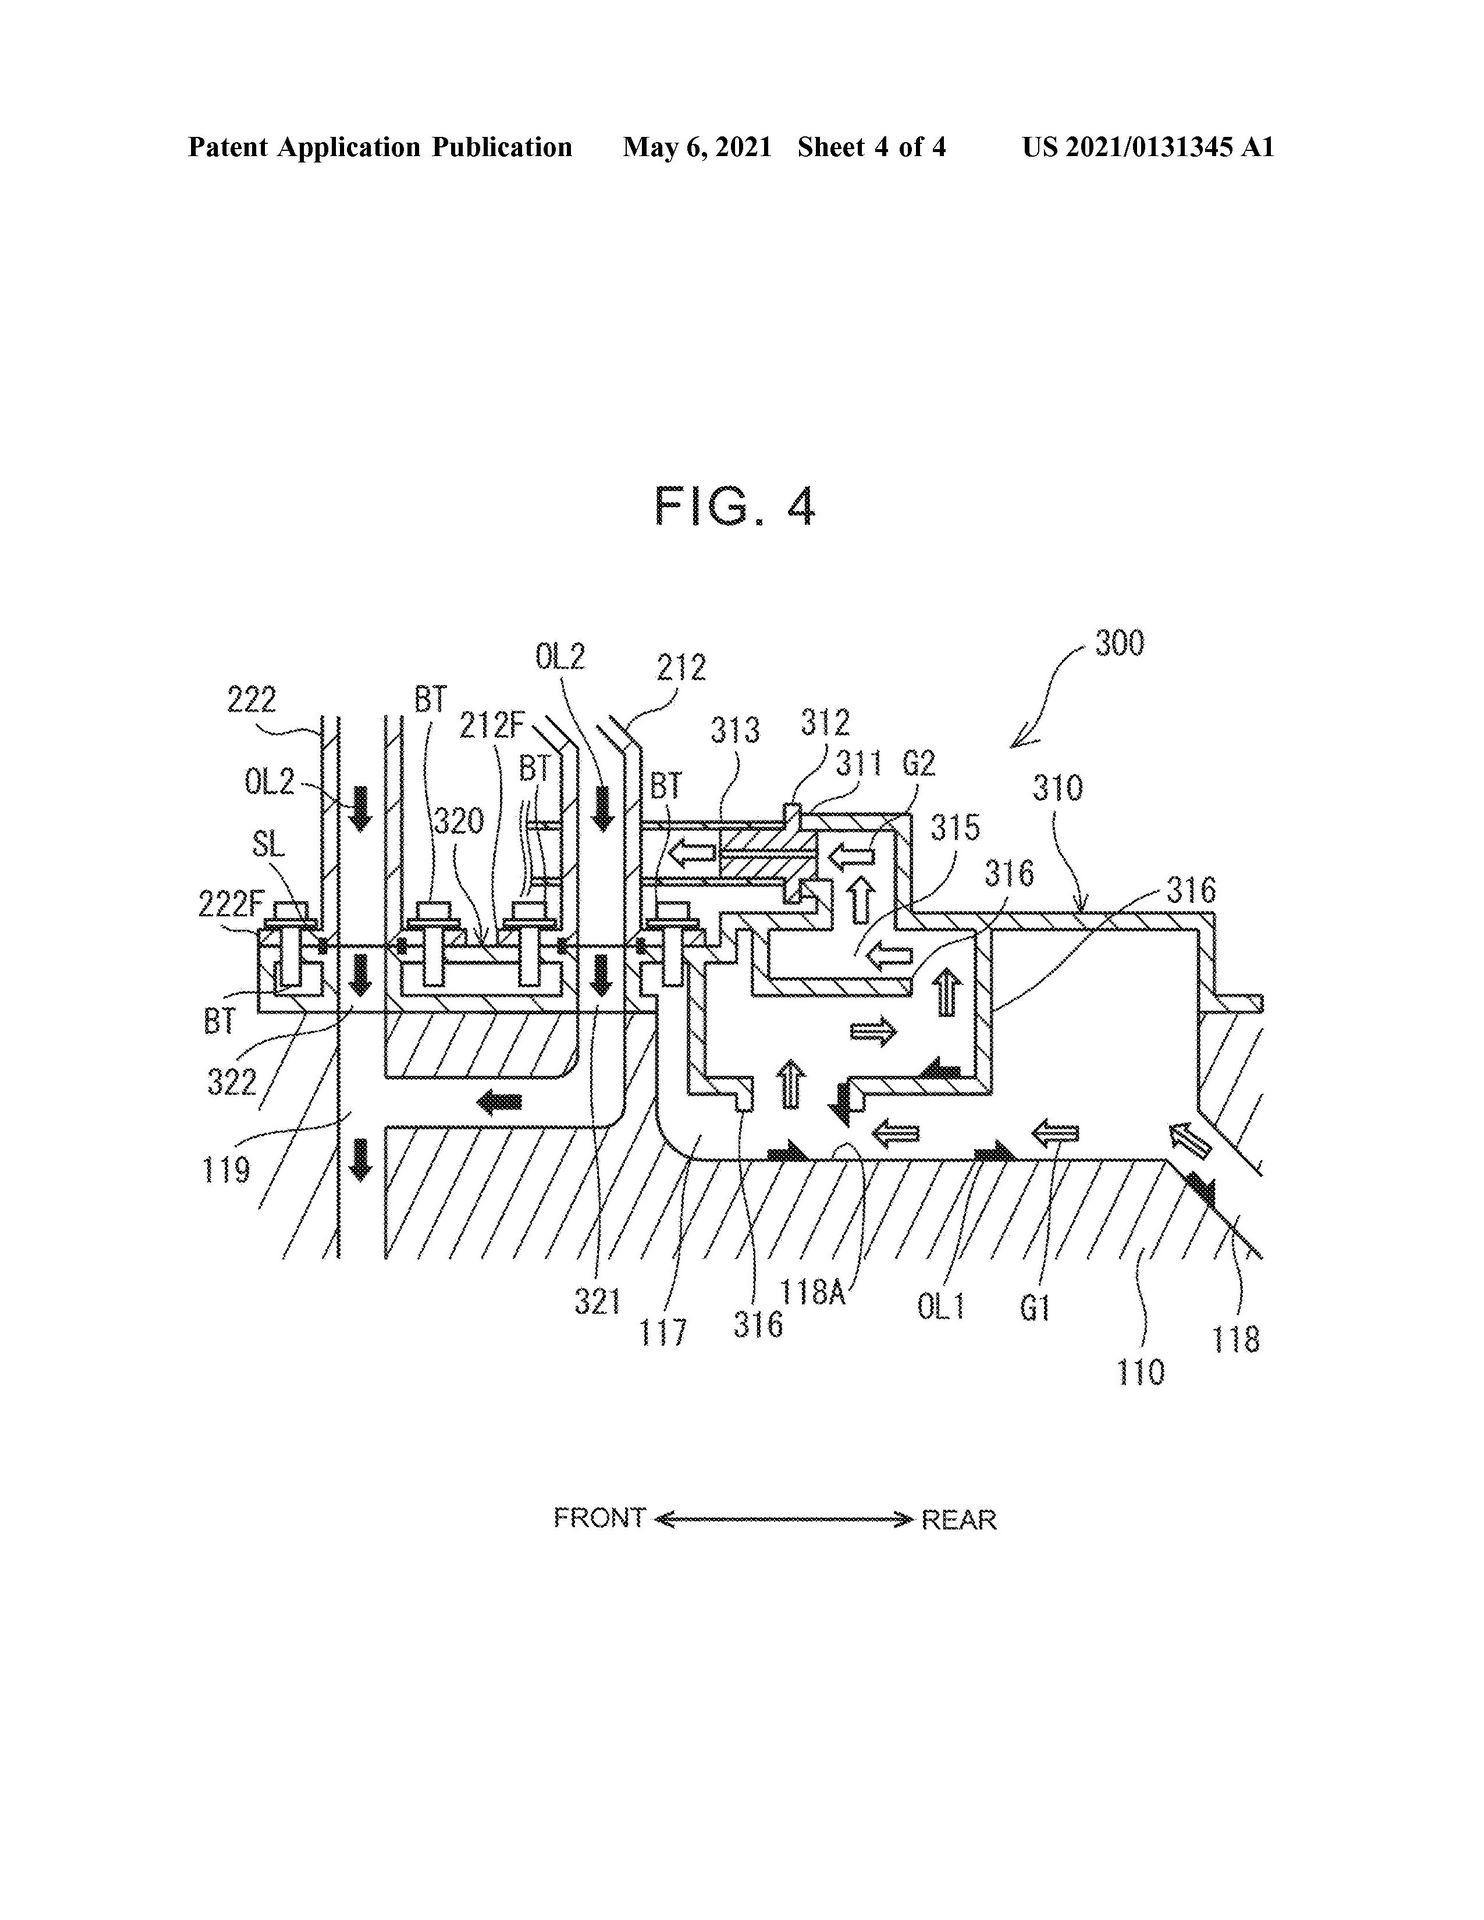 Toyota-Twin-Turbo-V8-Patent-0005